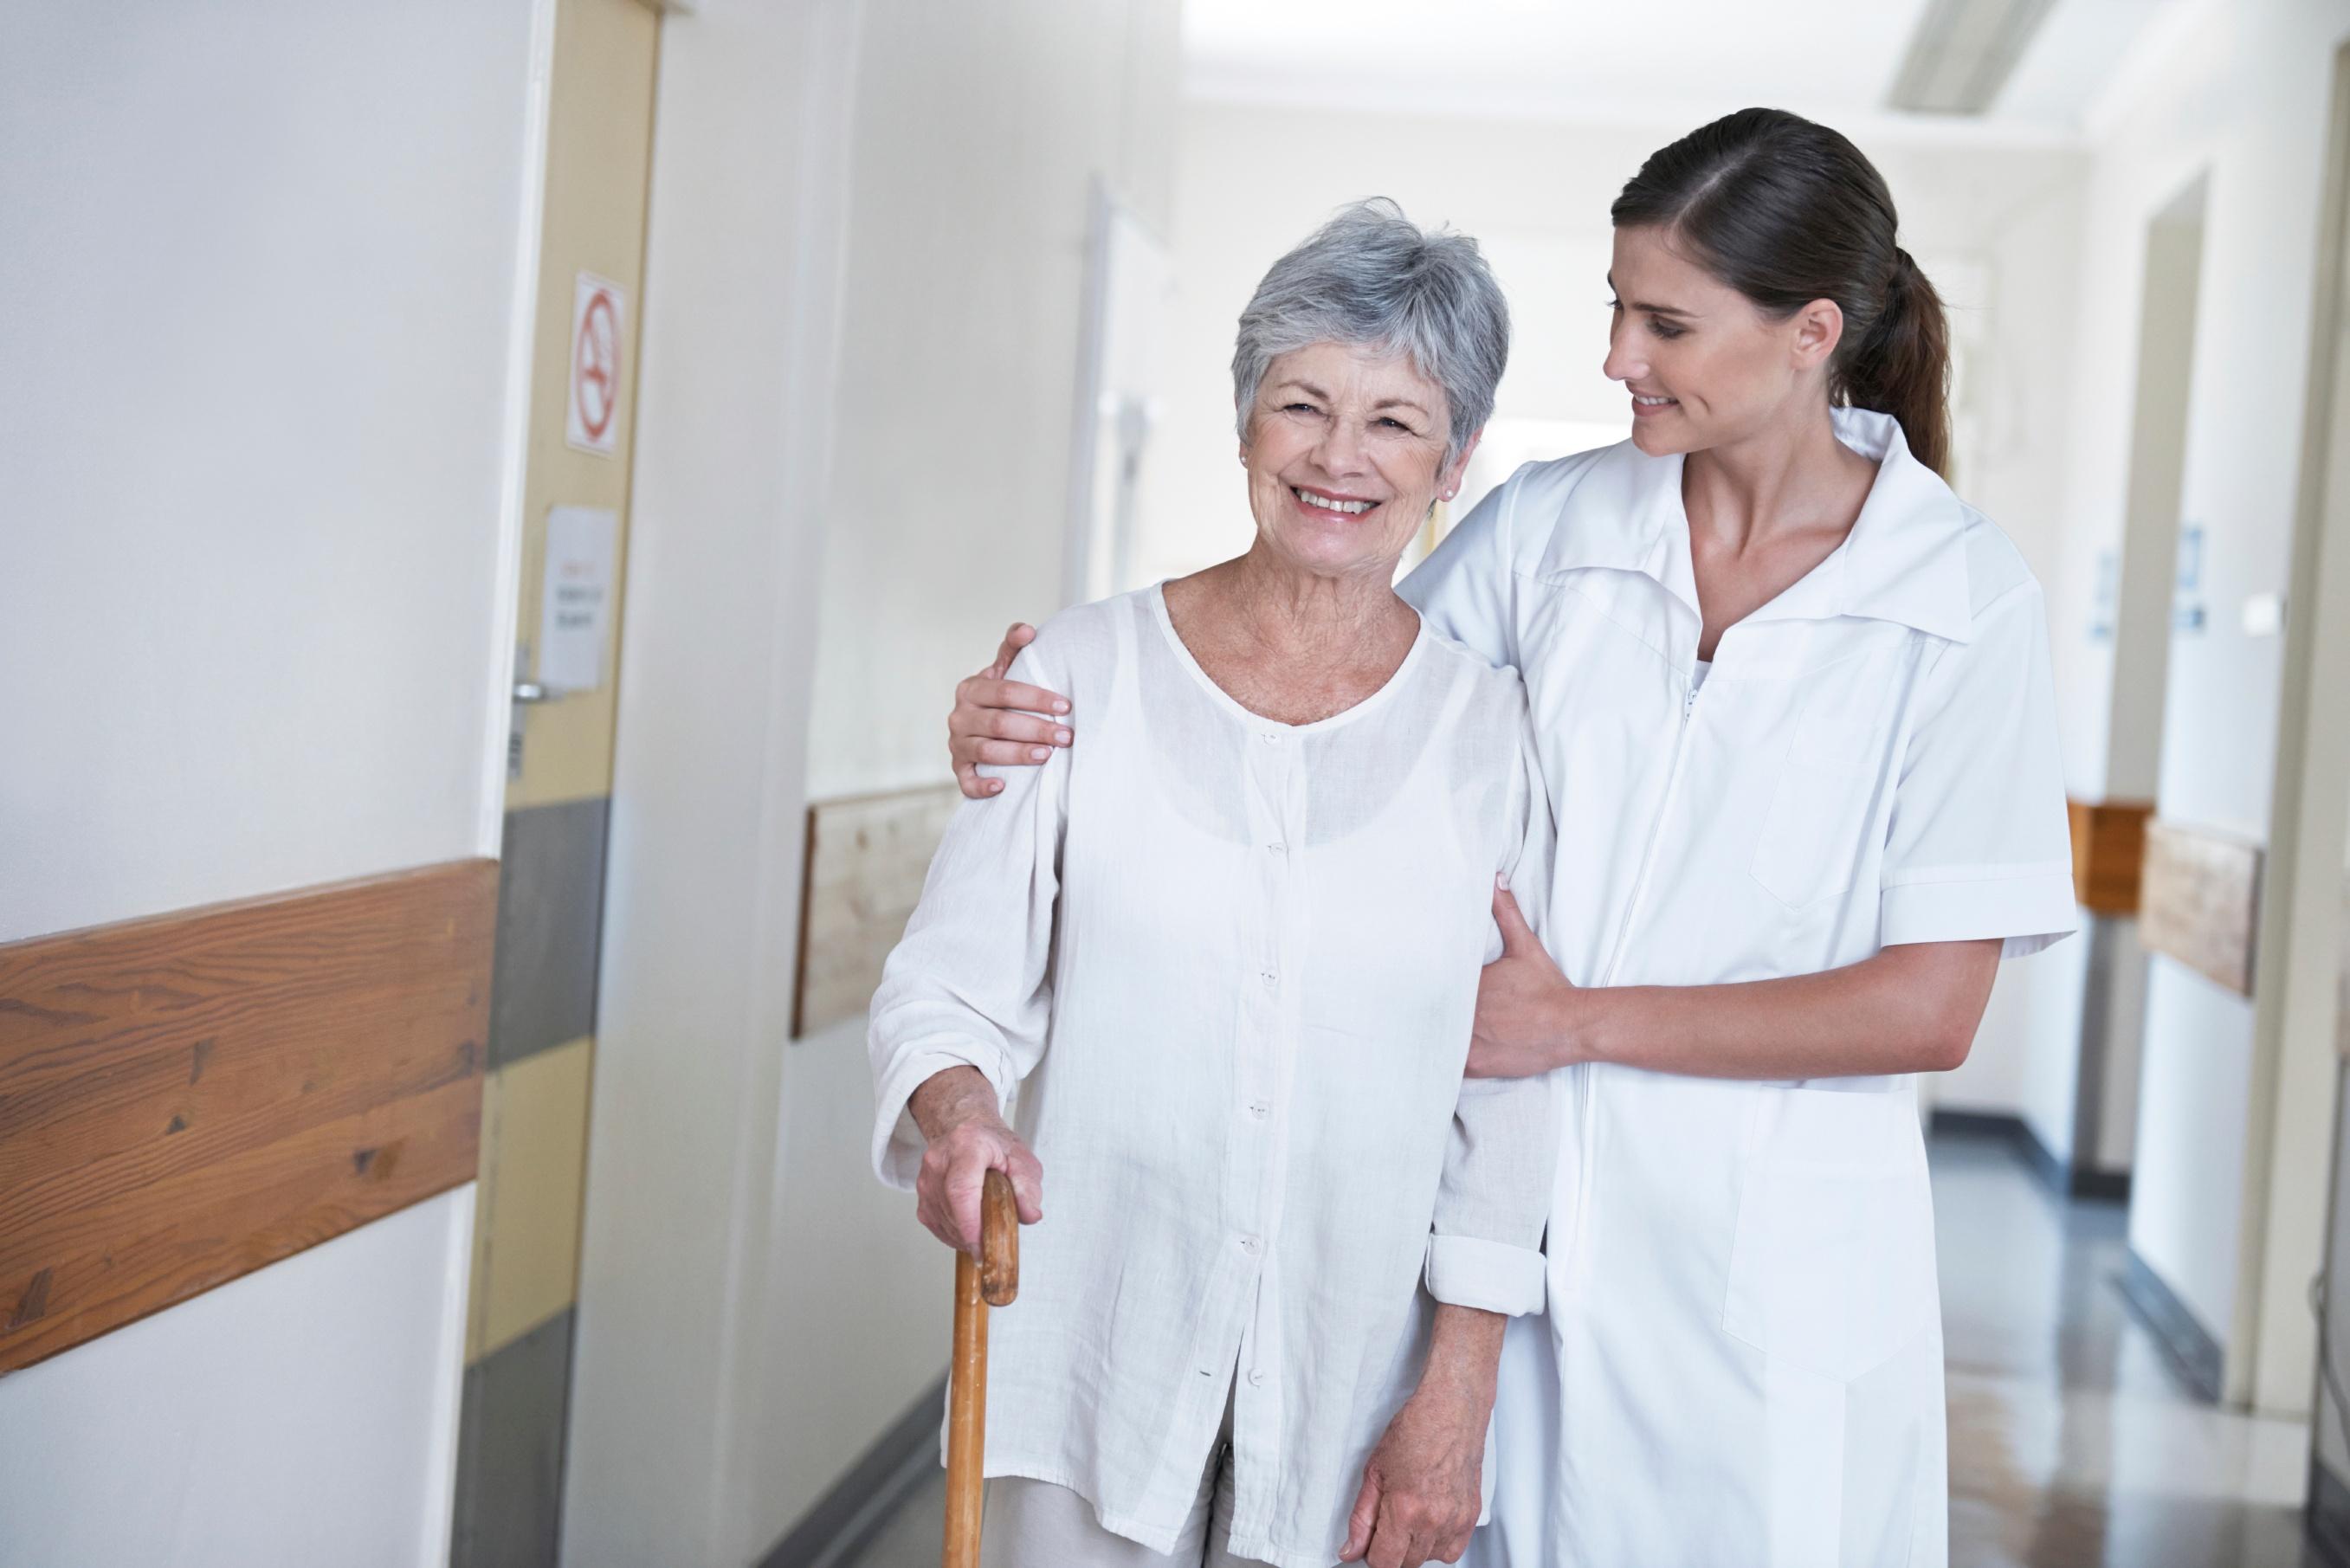 Workforce best practices in senior care